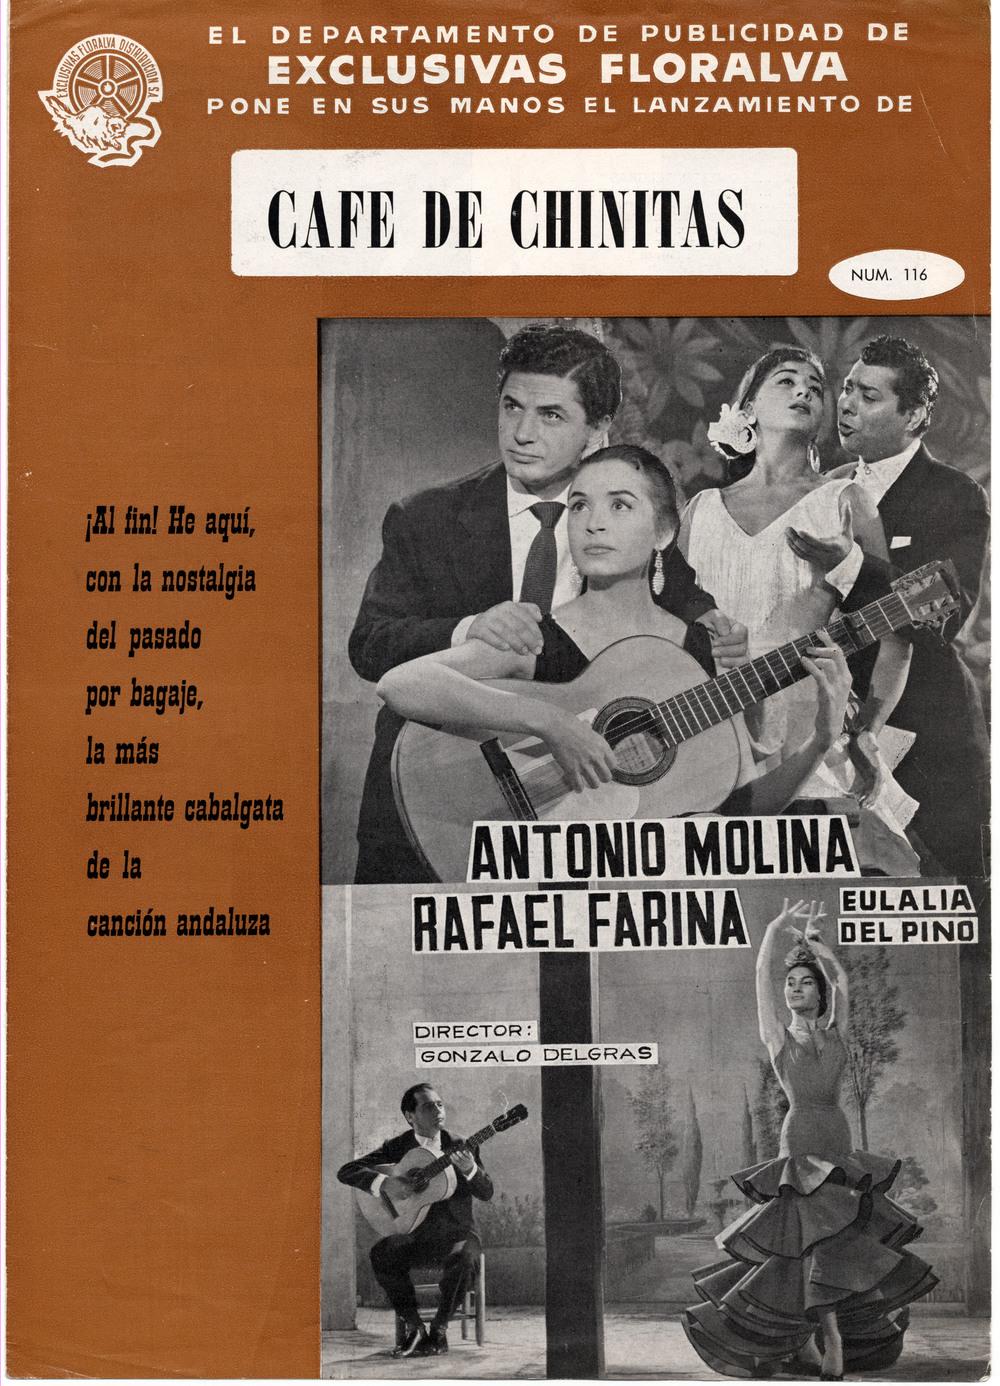 Café de chinitas.jpg